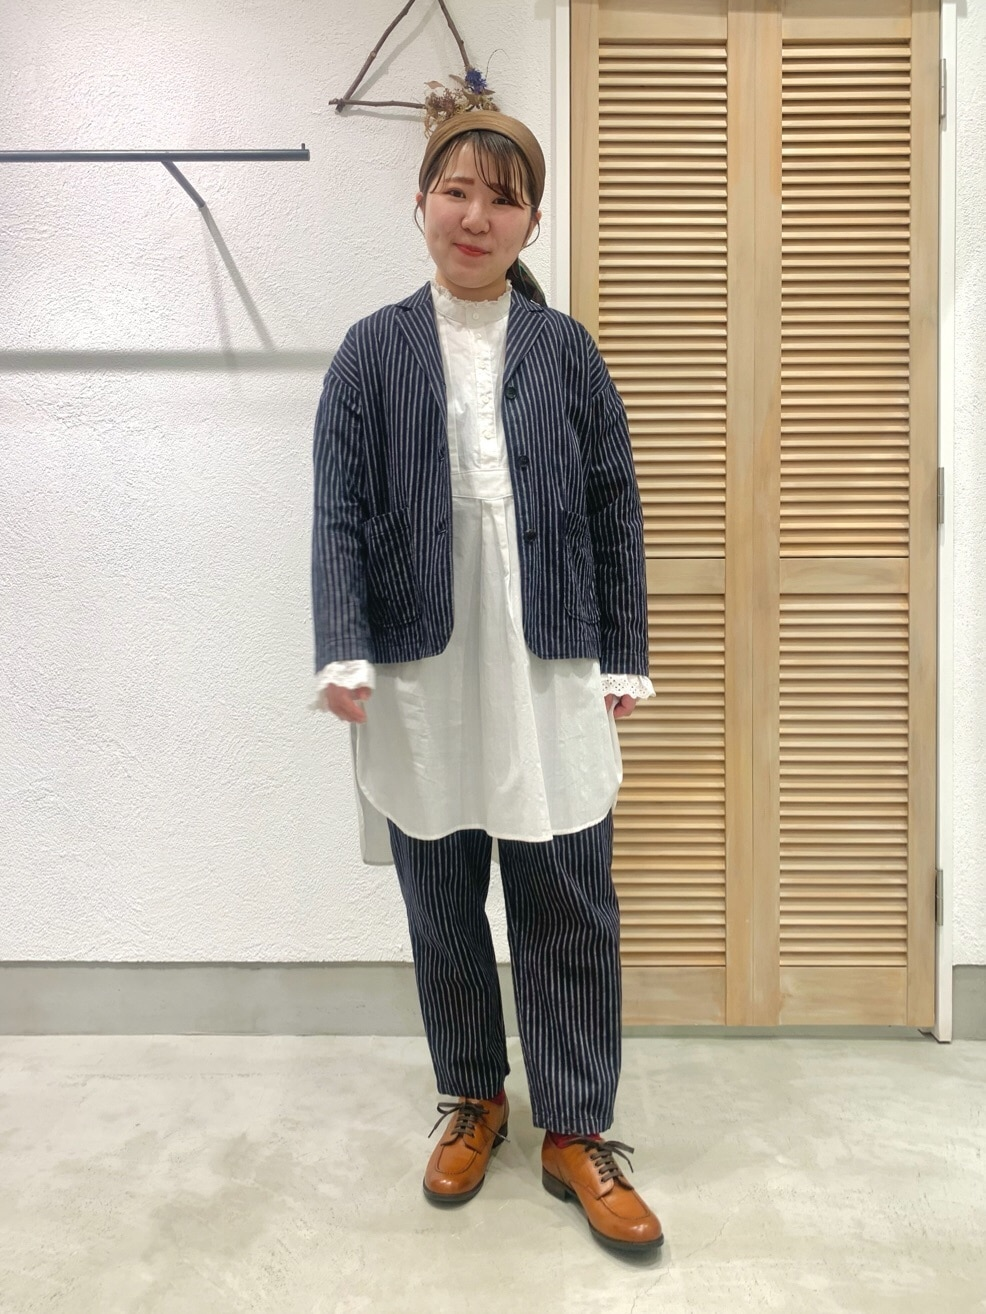 chambre de charme 横浜ジョイナス 身長:155cm 2021.03.22